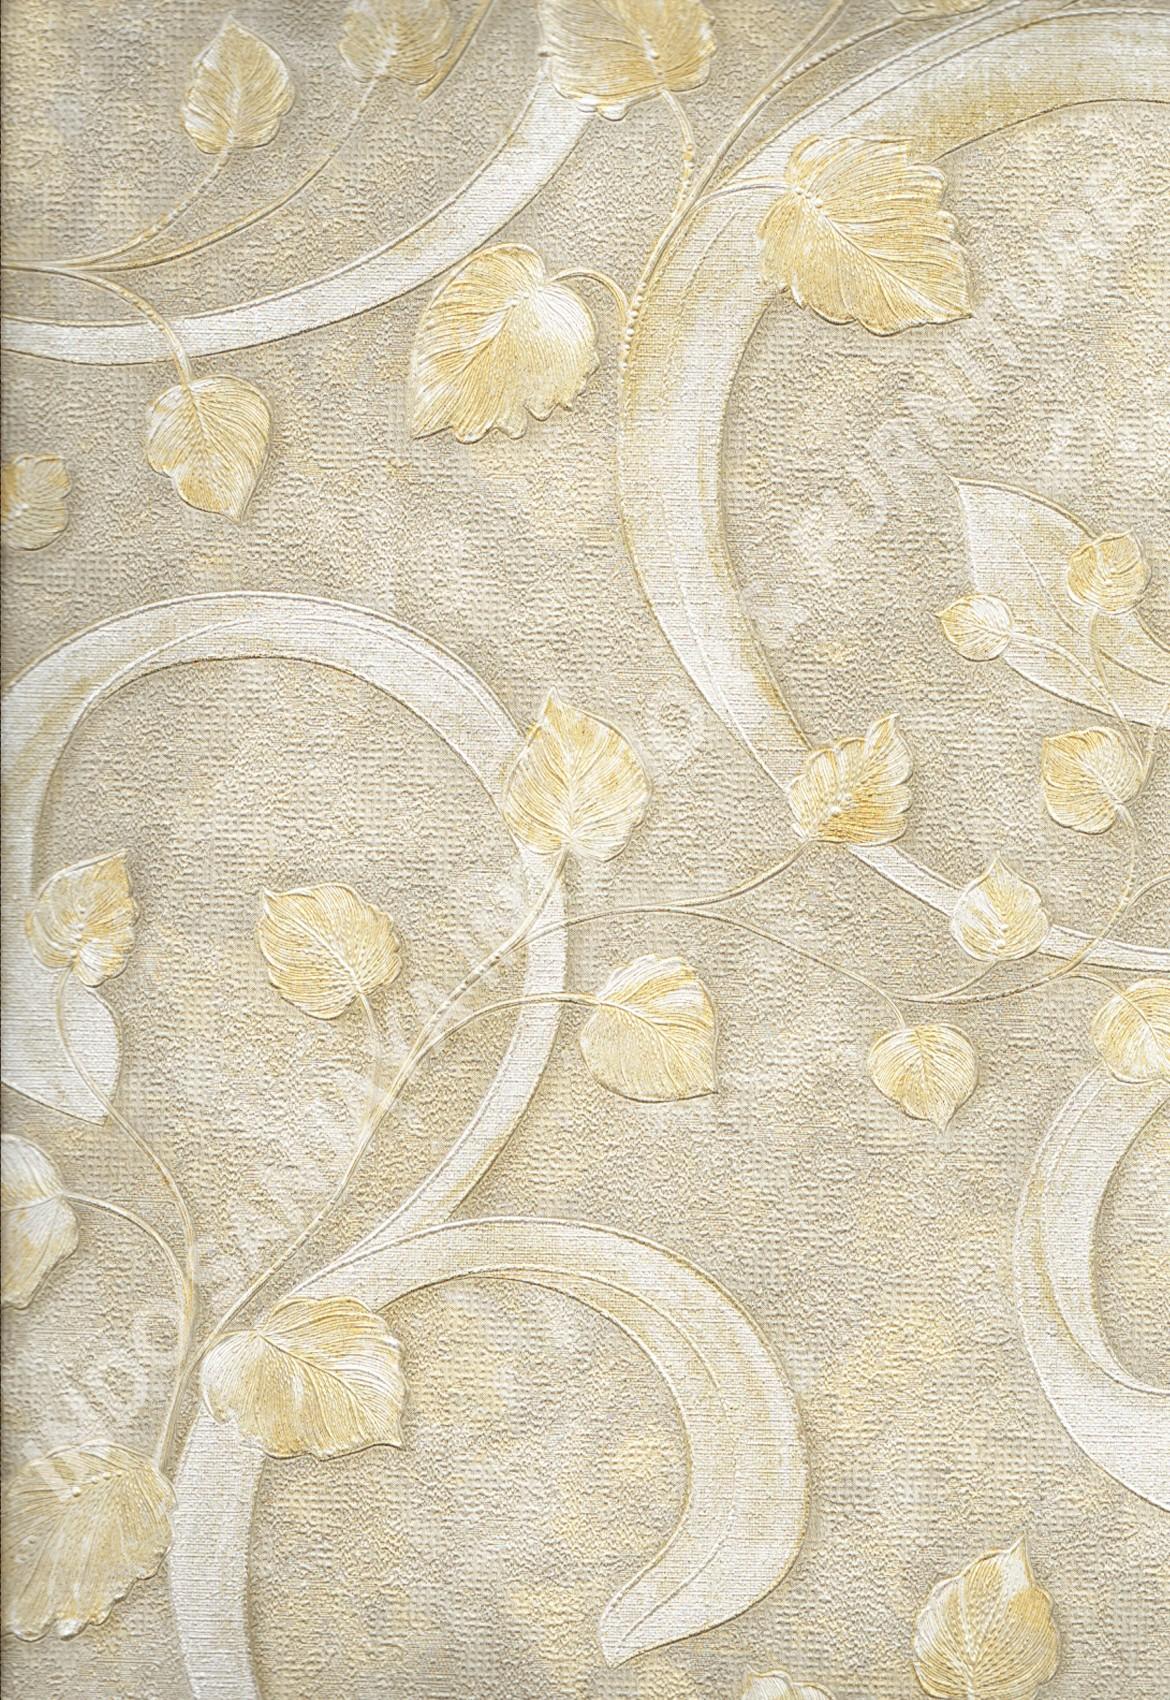 wallpaper   Wallpaper Klasik Batik (Damask) DL10402:DL10402 corak  warna